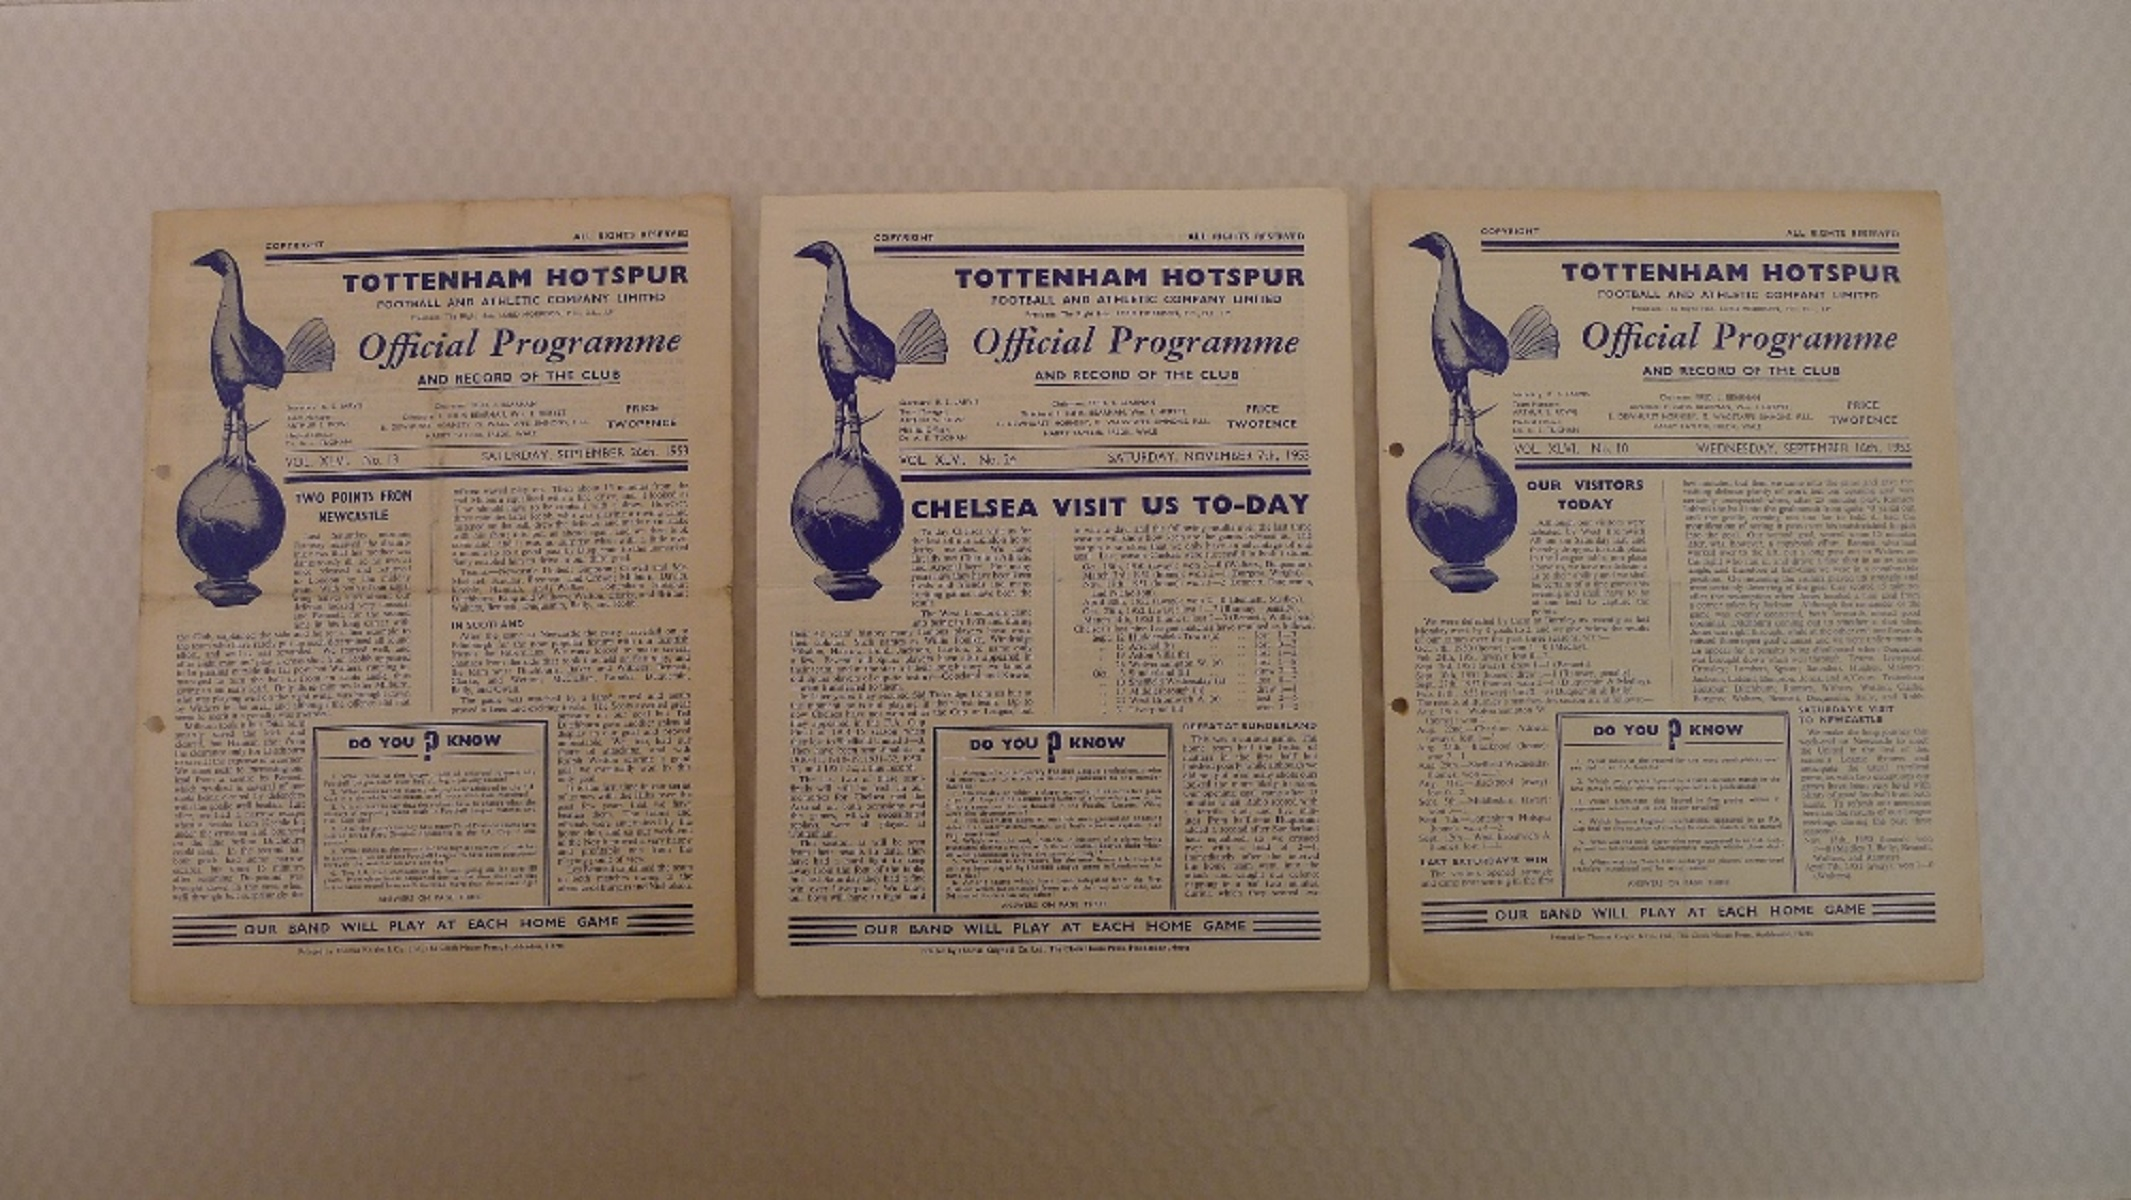 Vintage Football Programmes. 3 x Tottenham Hotspur 1953 football programmes comprising v Burnley